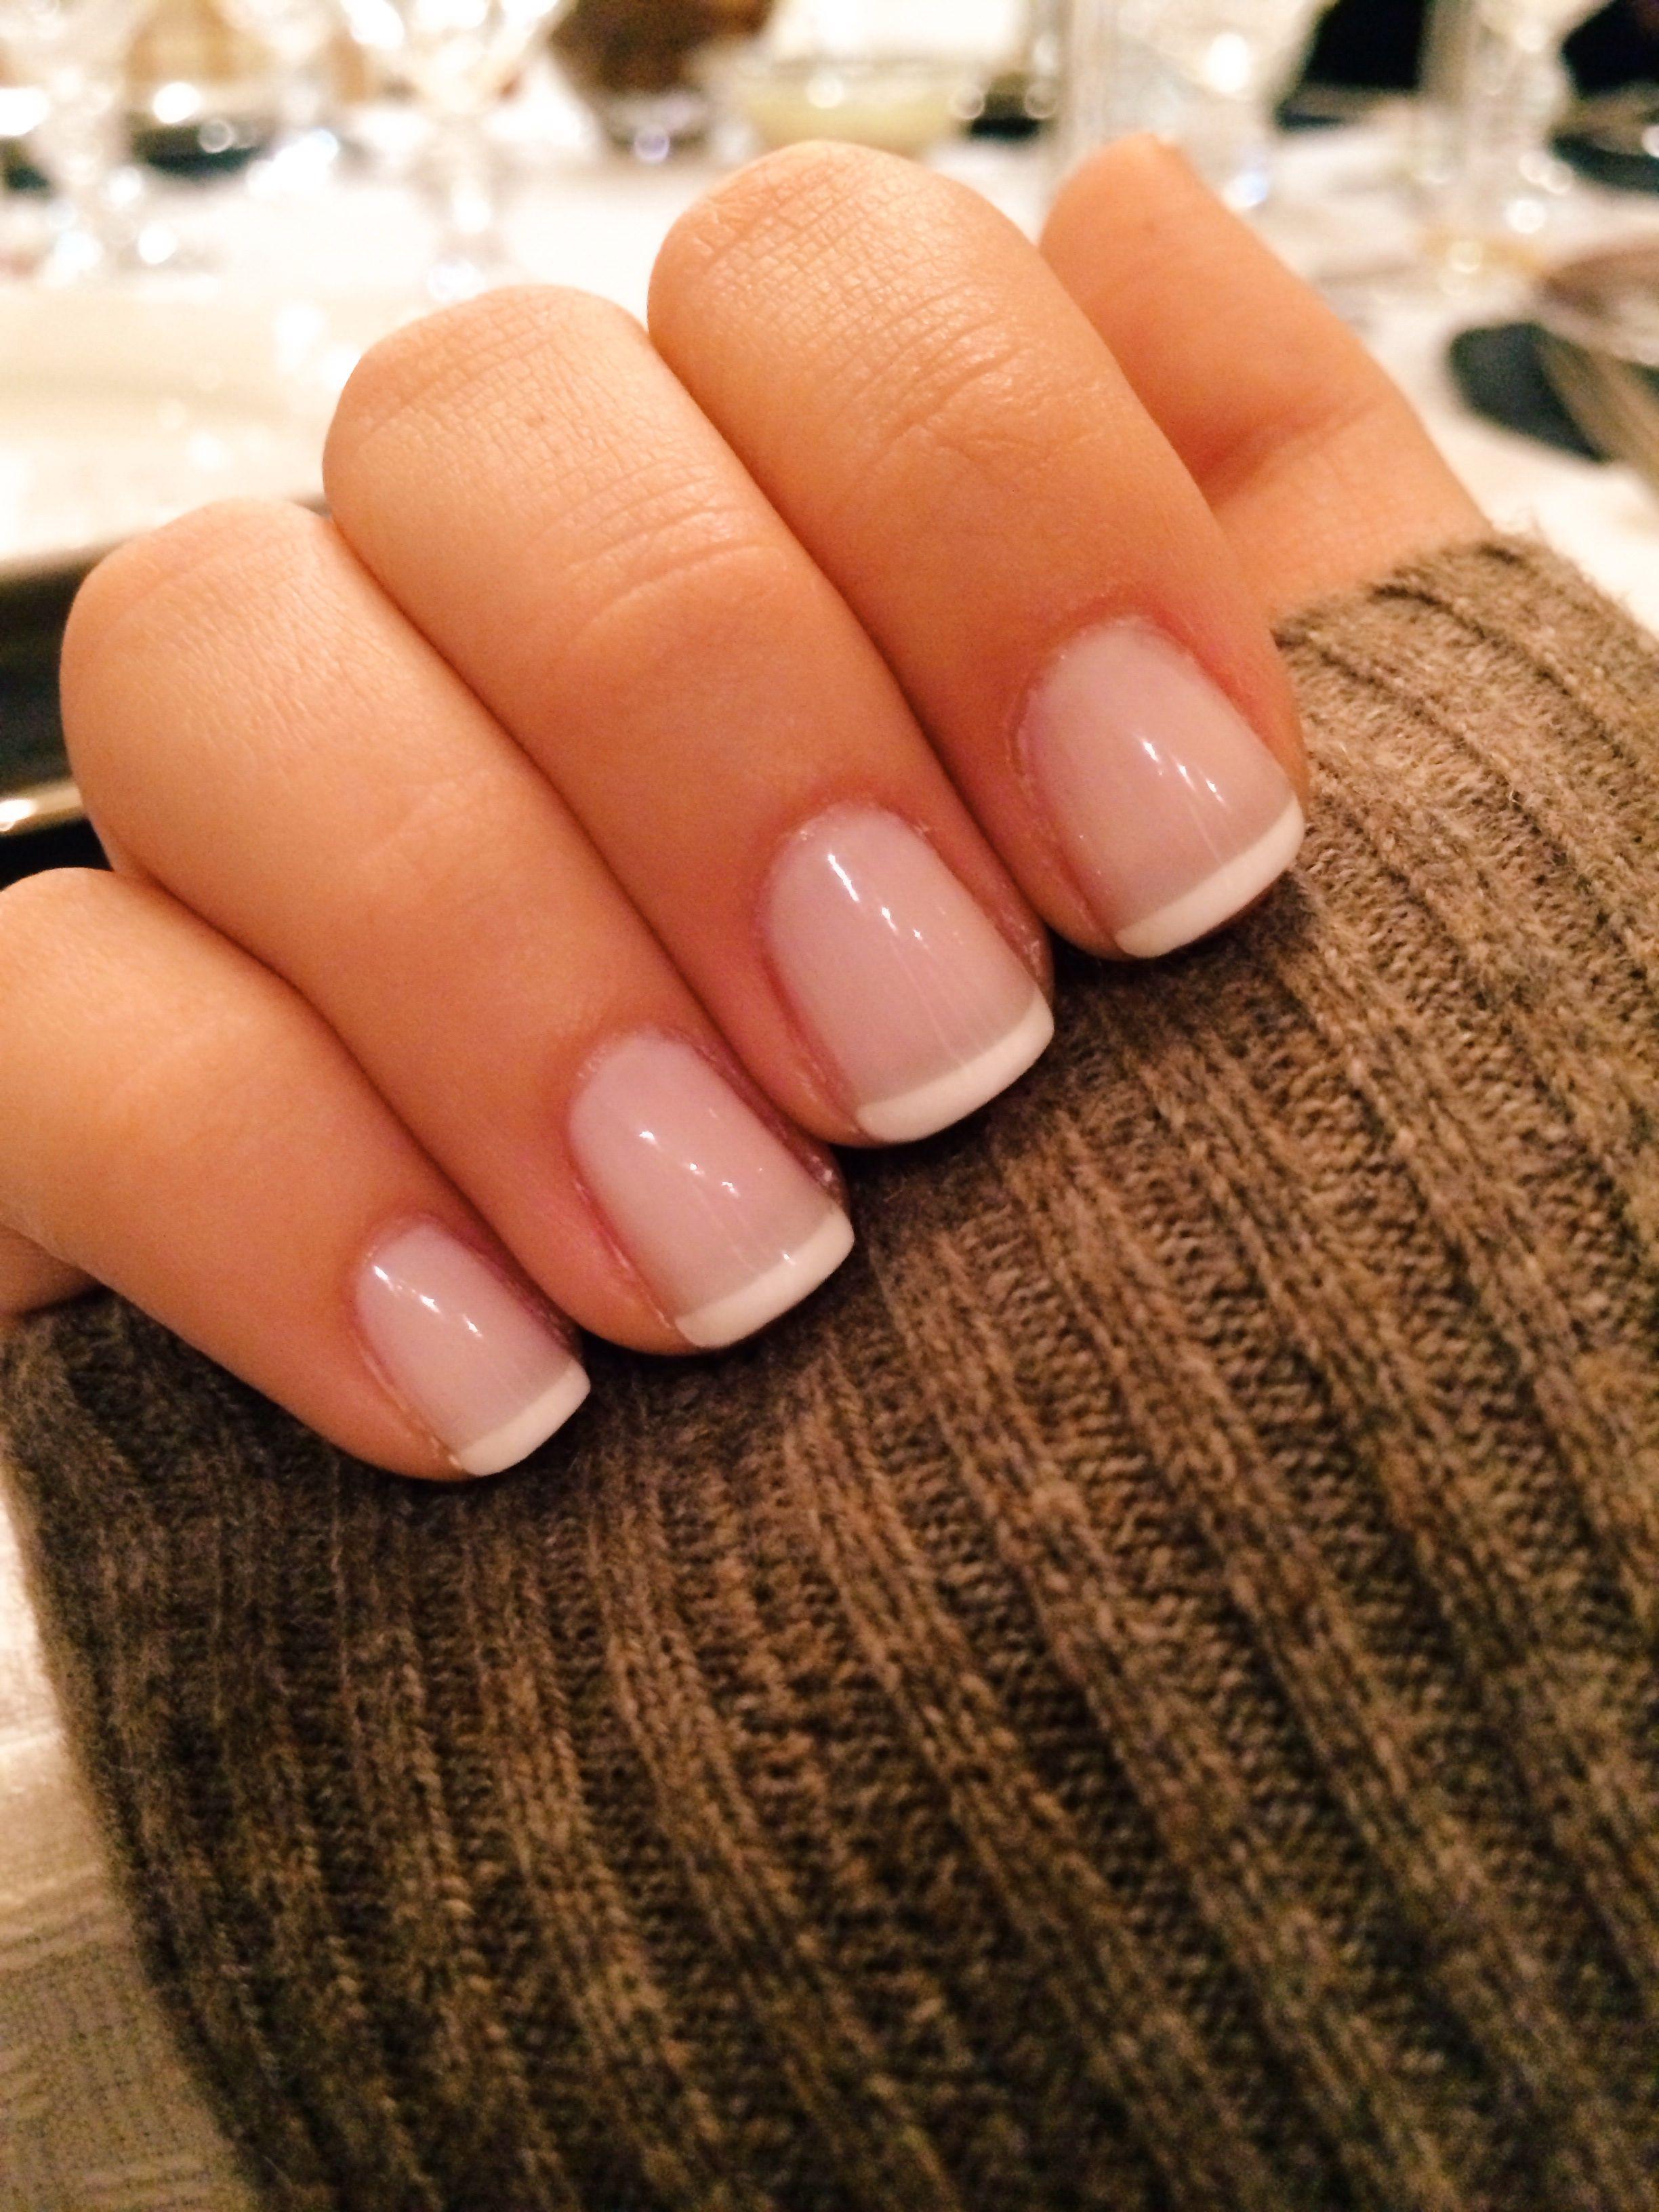 Classy french manicure using waltz by essie makeupuunails